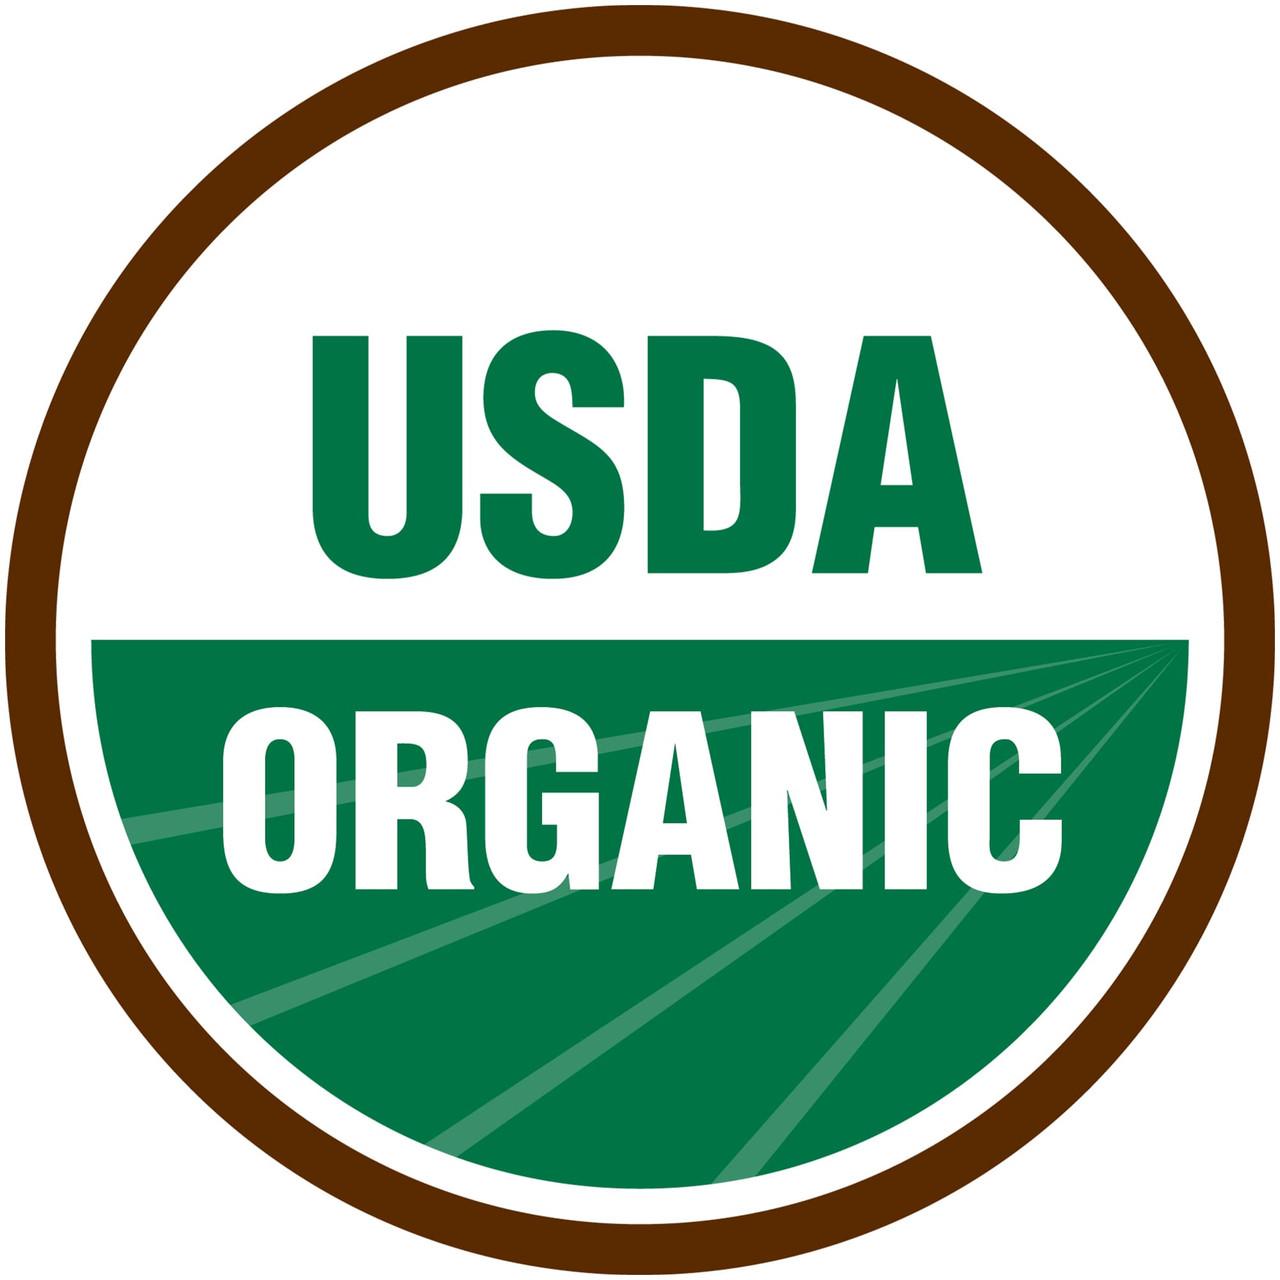 Vanilla Organic Flavored Coffee by EKOCUPS